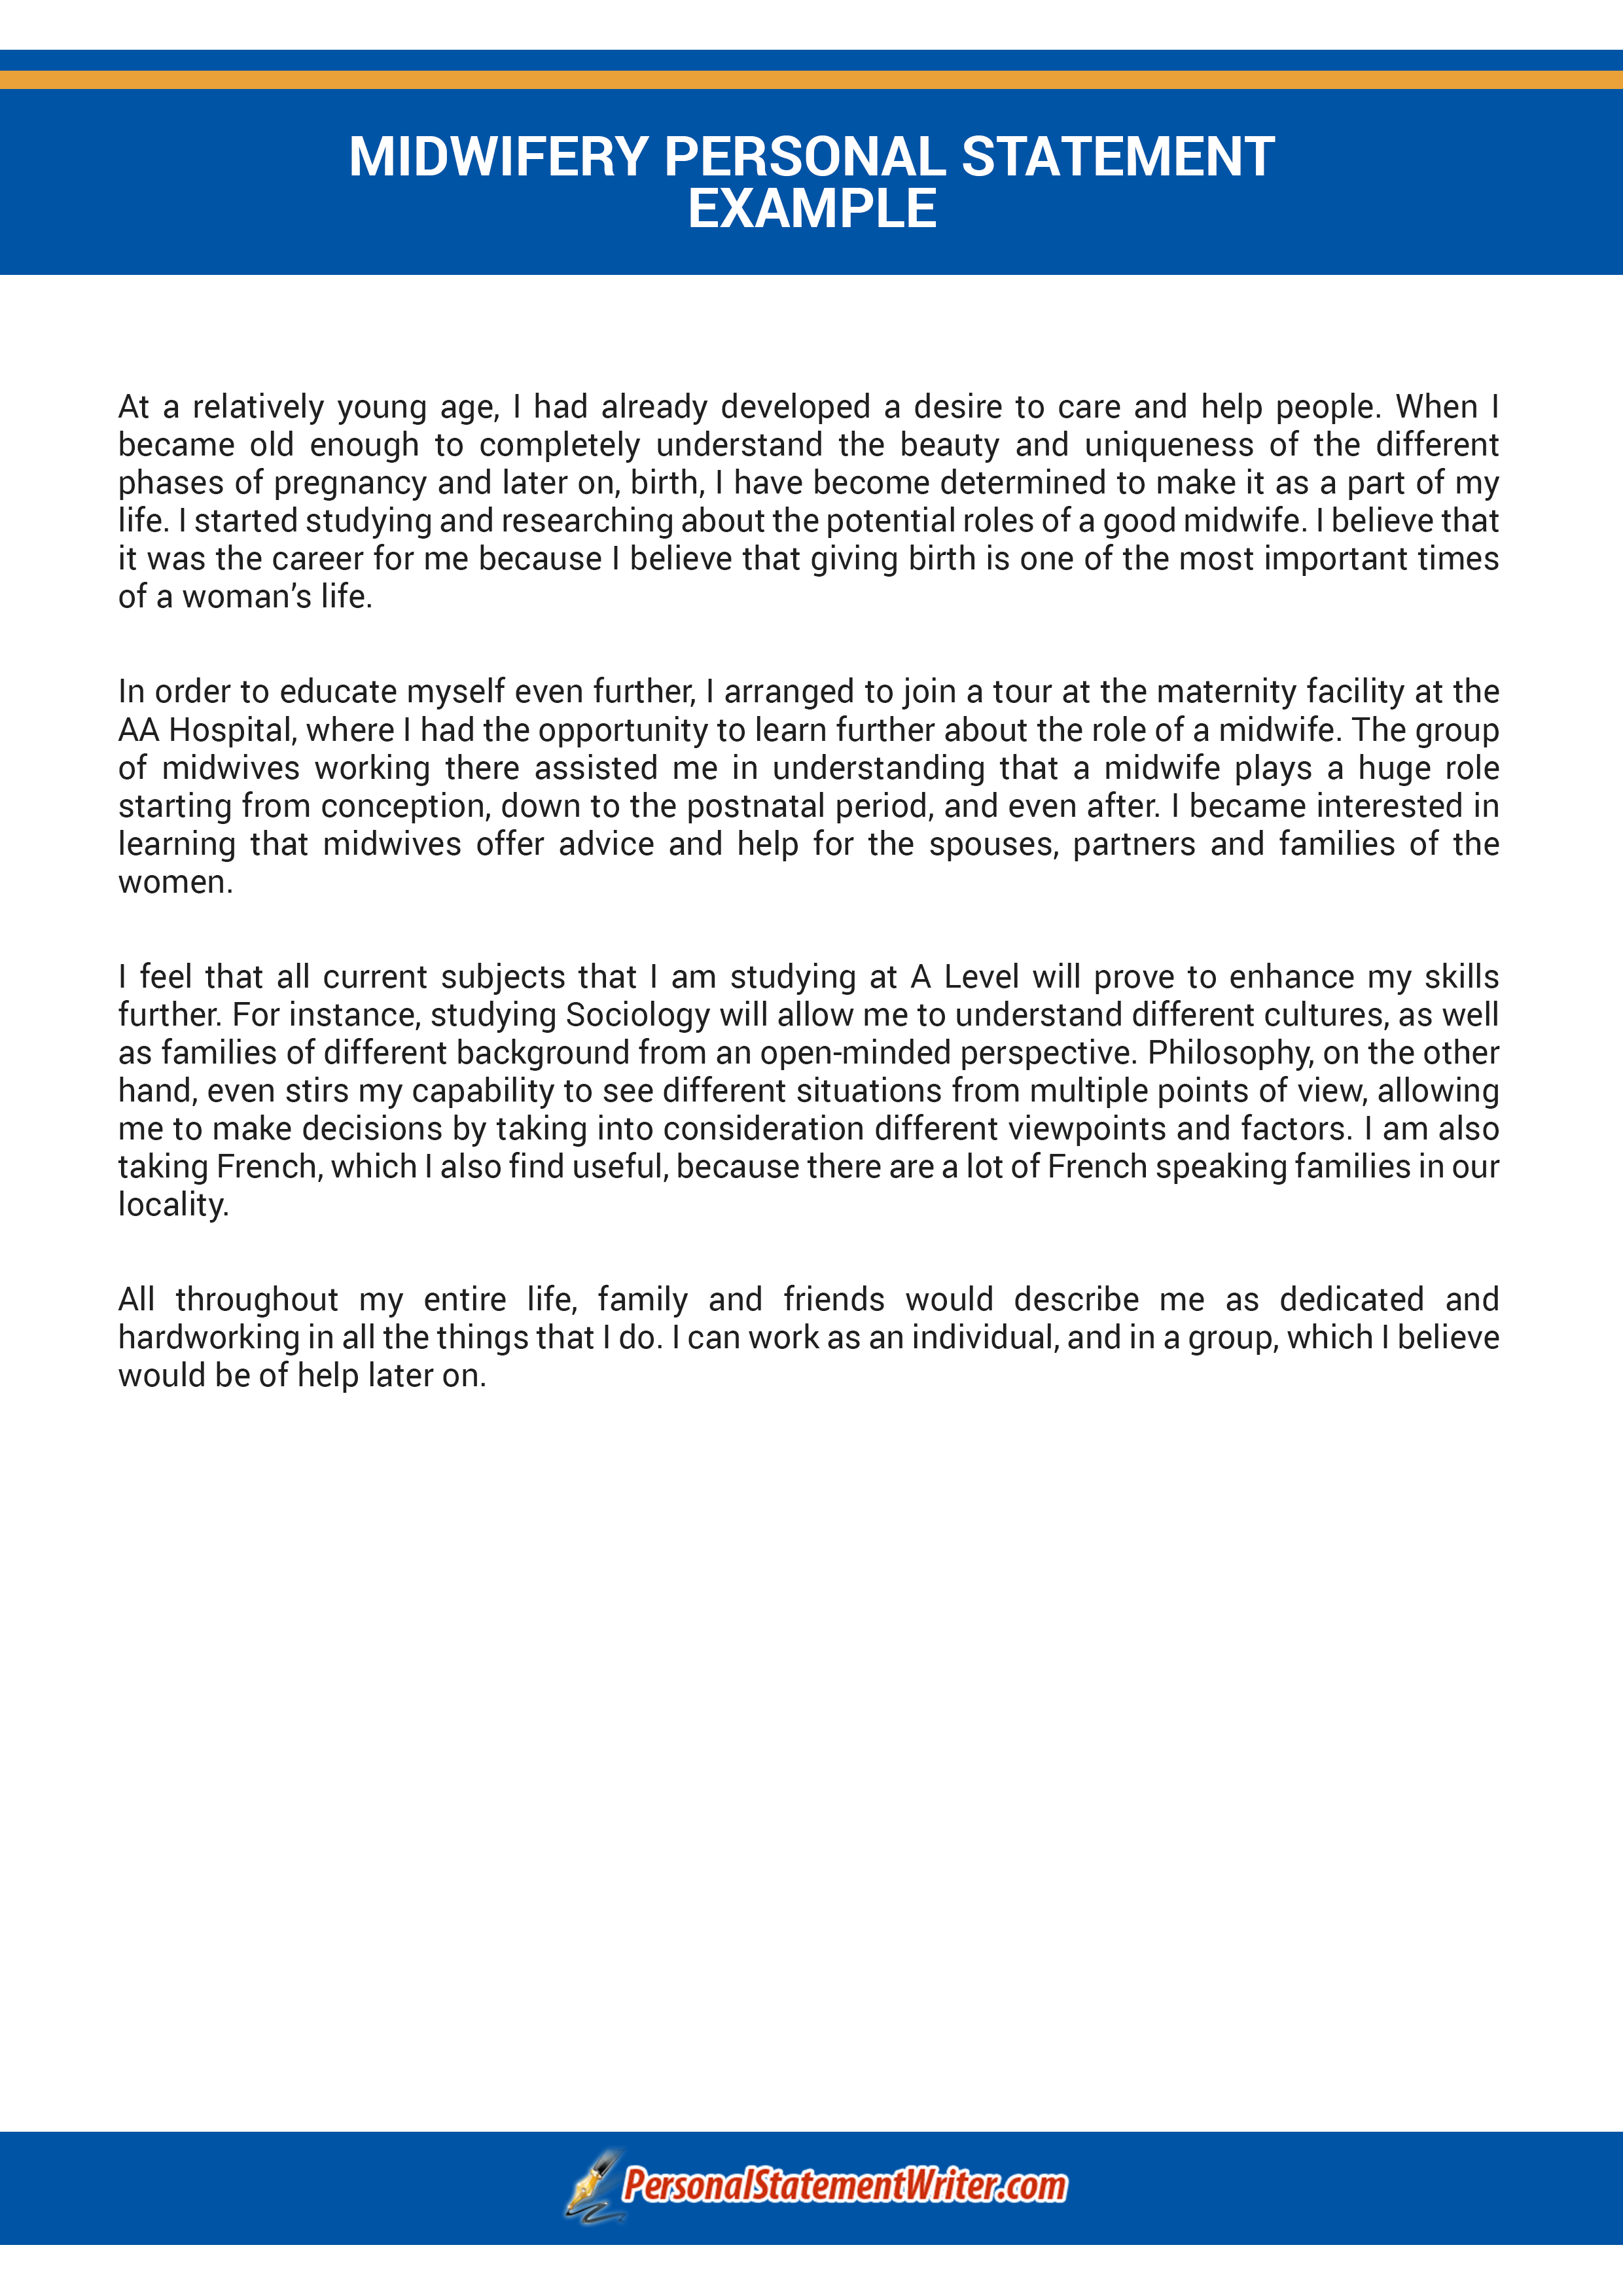 get midwifery personal statement